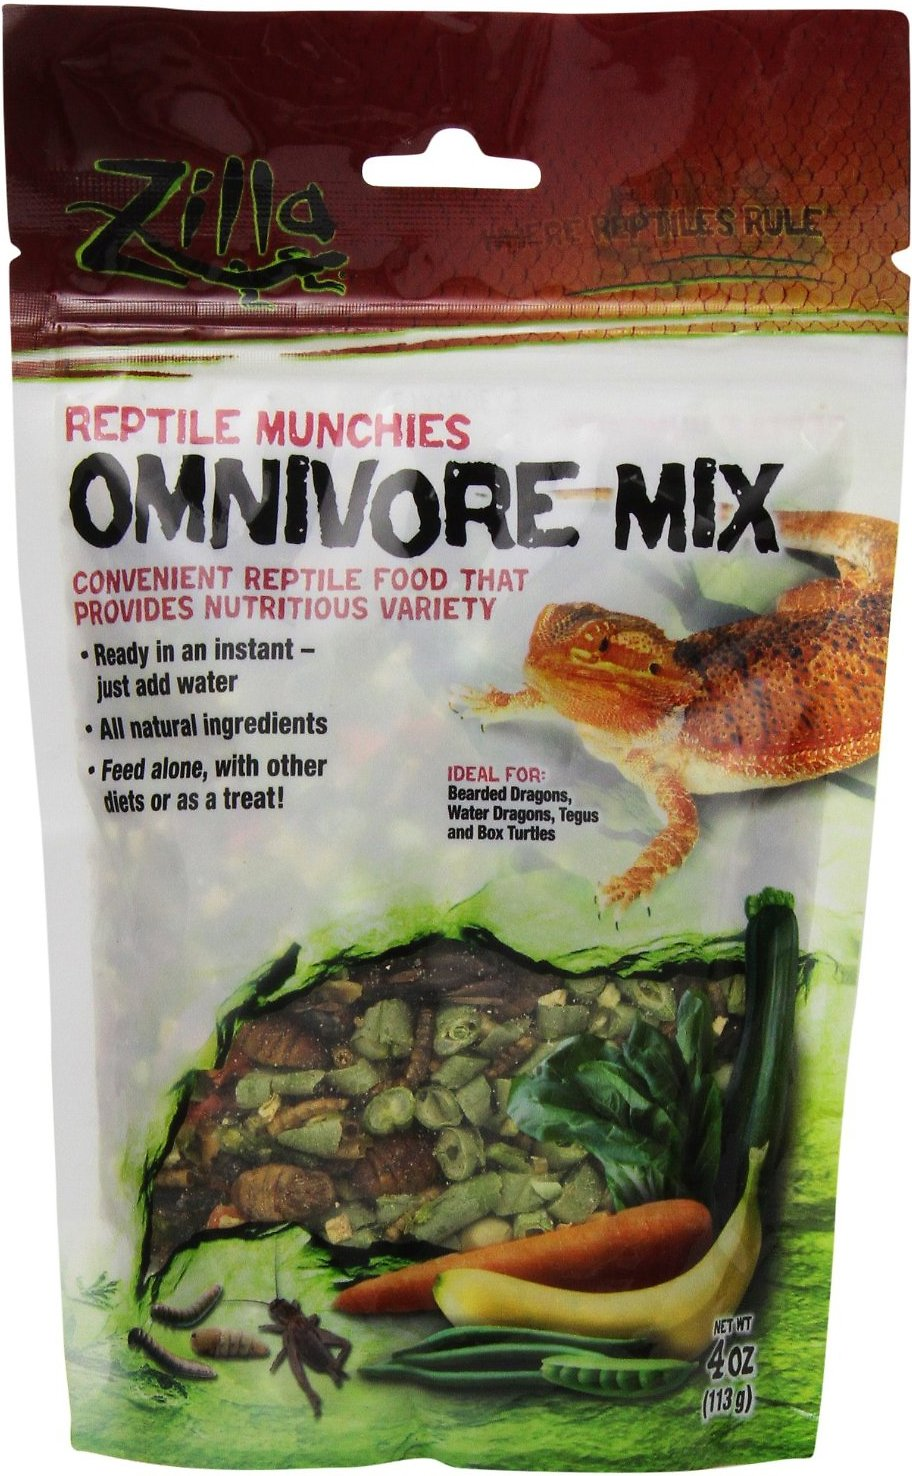 Zilla Reptile Munchies Omnivore Mix Lizard Food, 4-oz bag